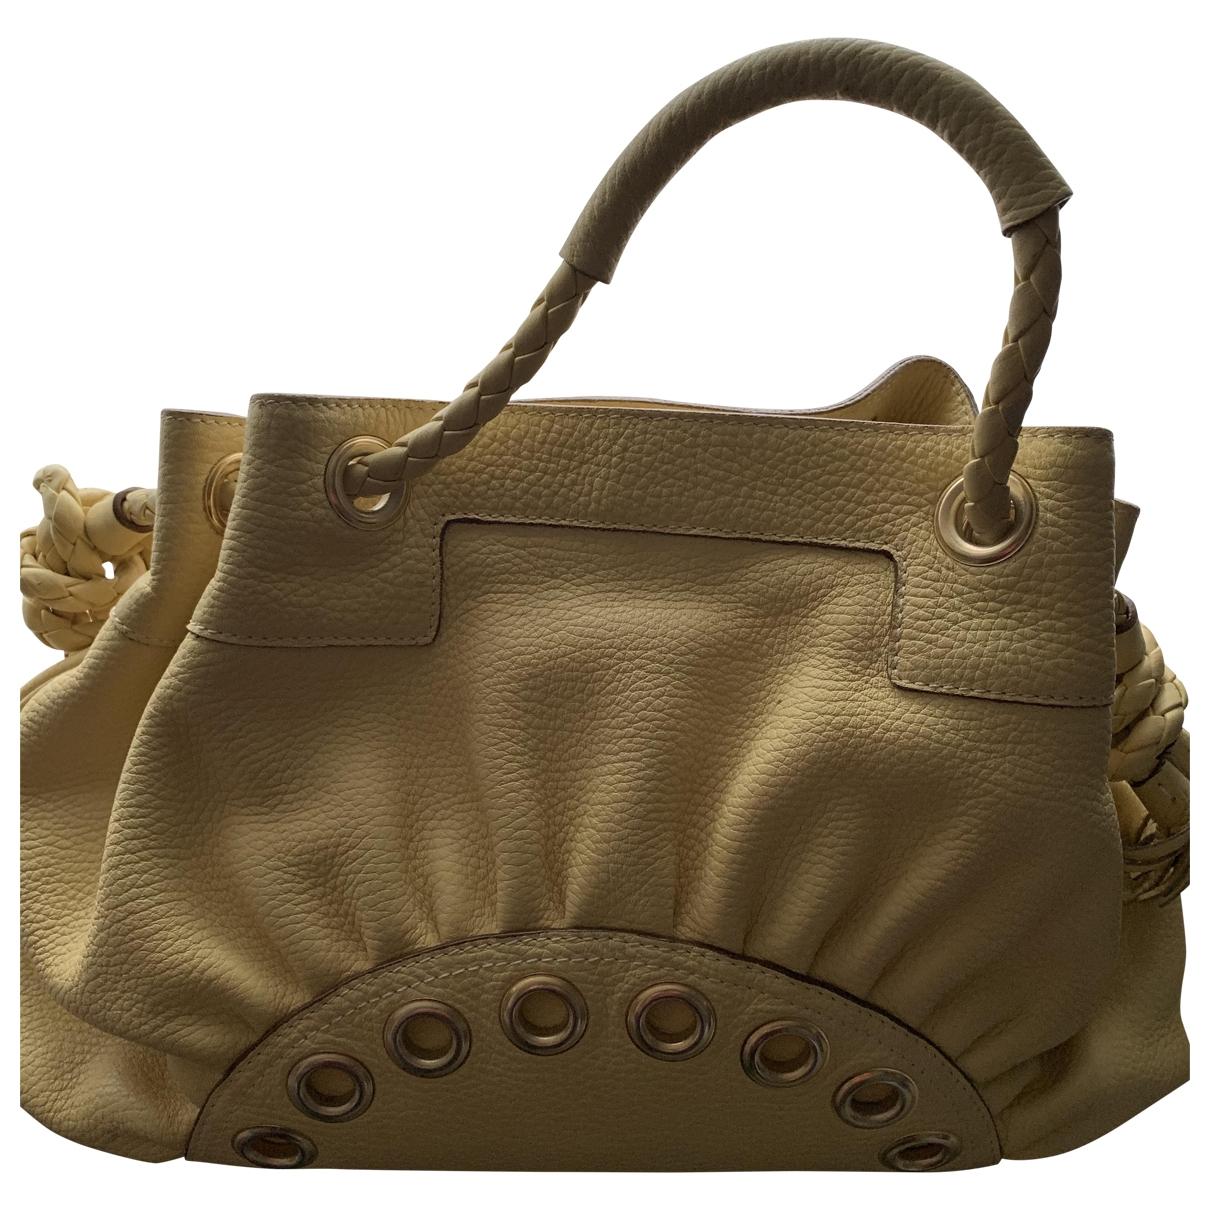 Anya Hindmarch \N Yellow Leather handbag for Women \N